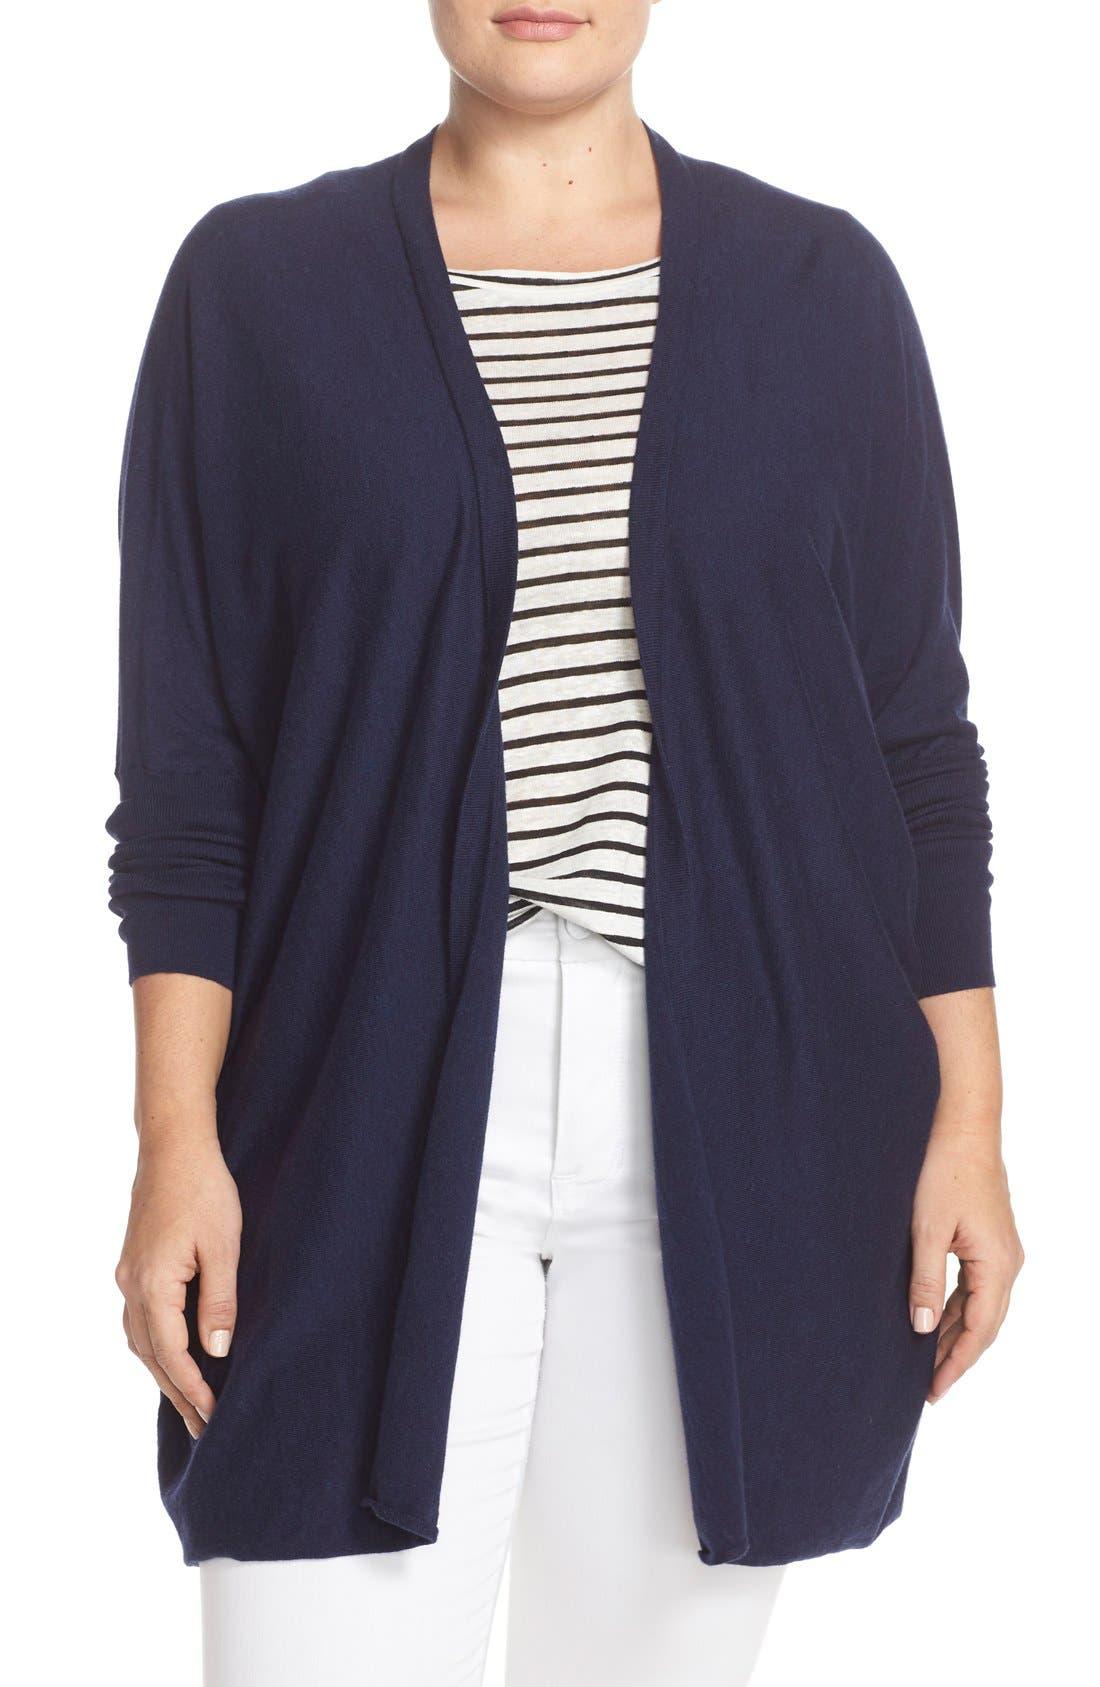 Tart 'Darma' Cotton & Cashmere Knit Cardigan (Plus Size)